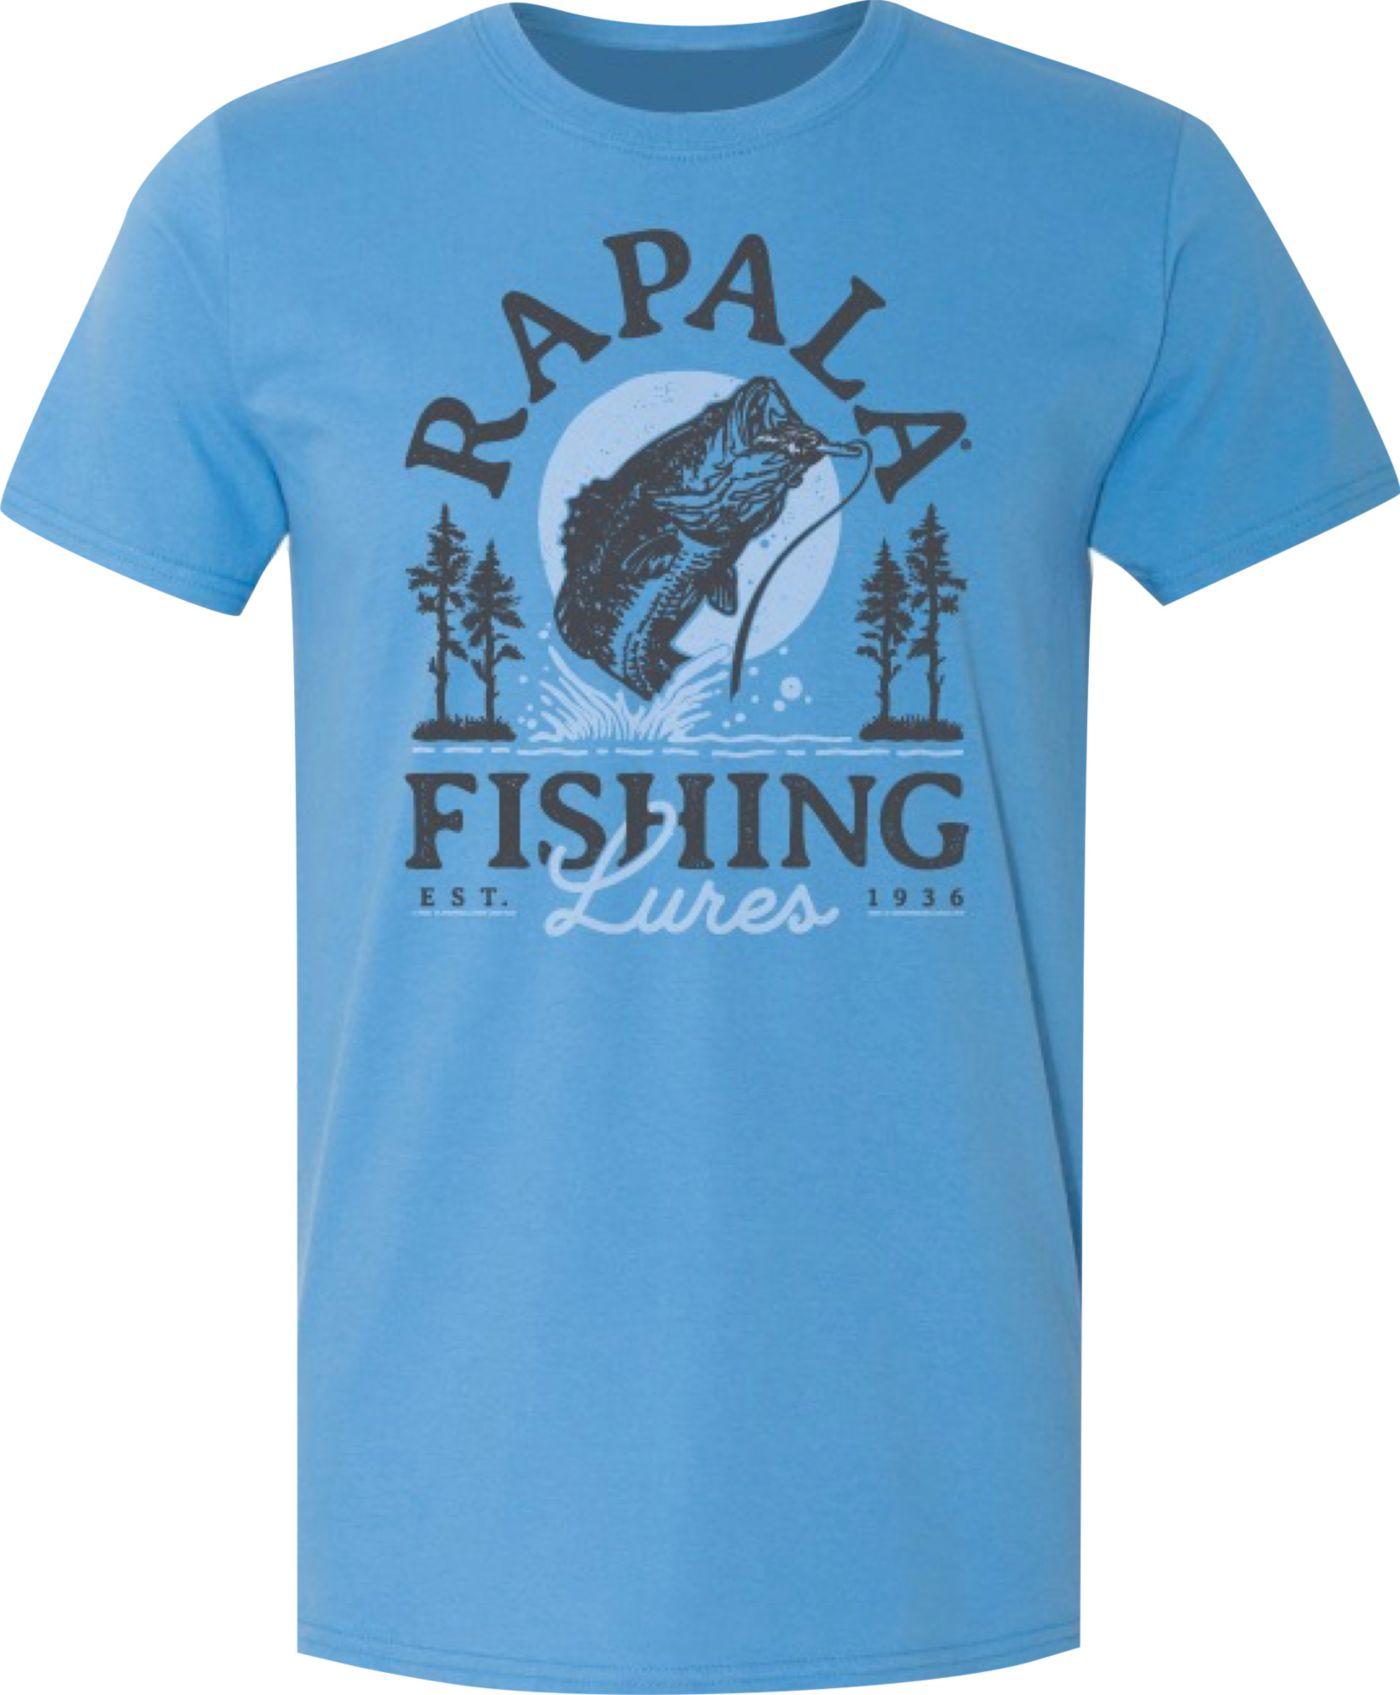 Rapala Men's 1936 Fishing Lures T-Shirt